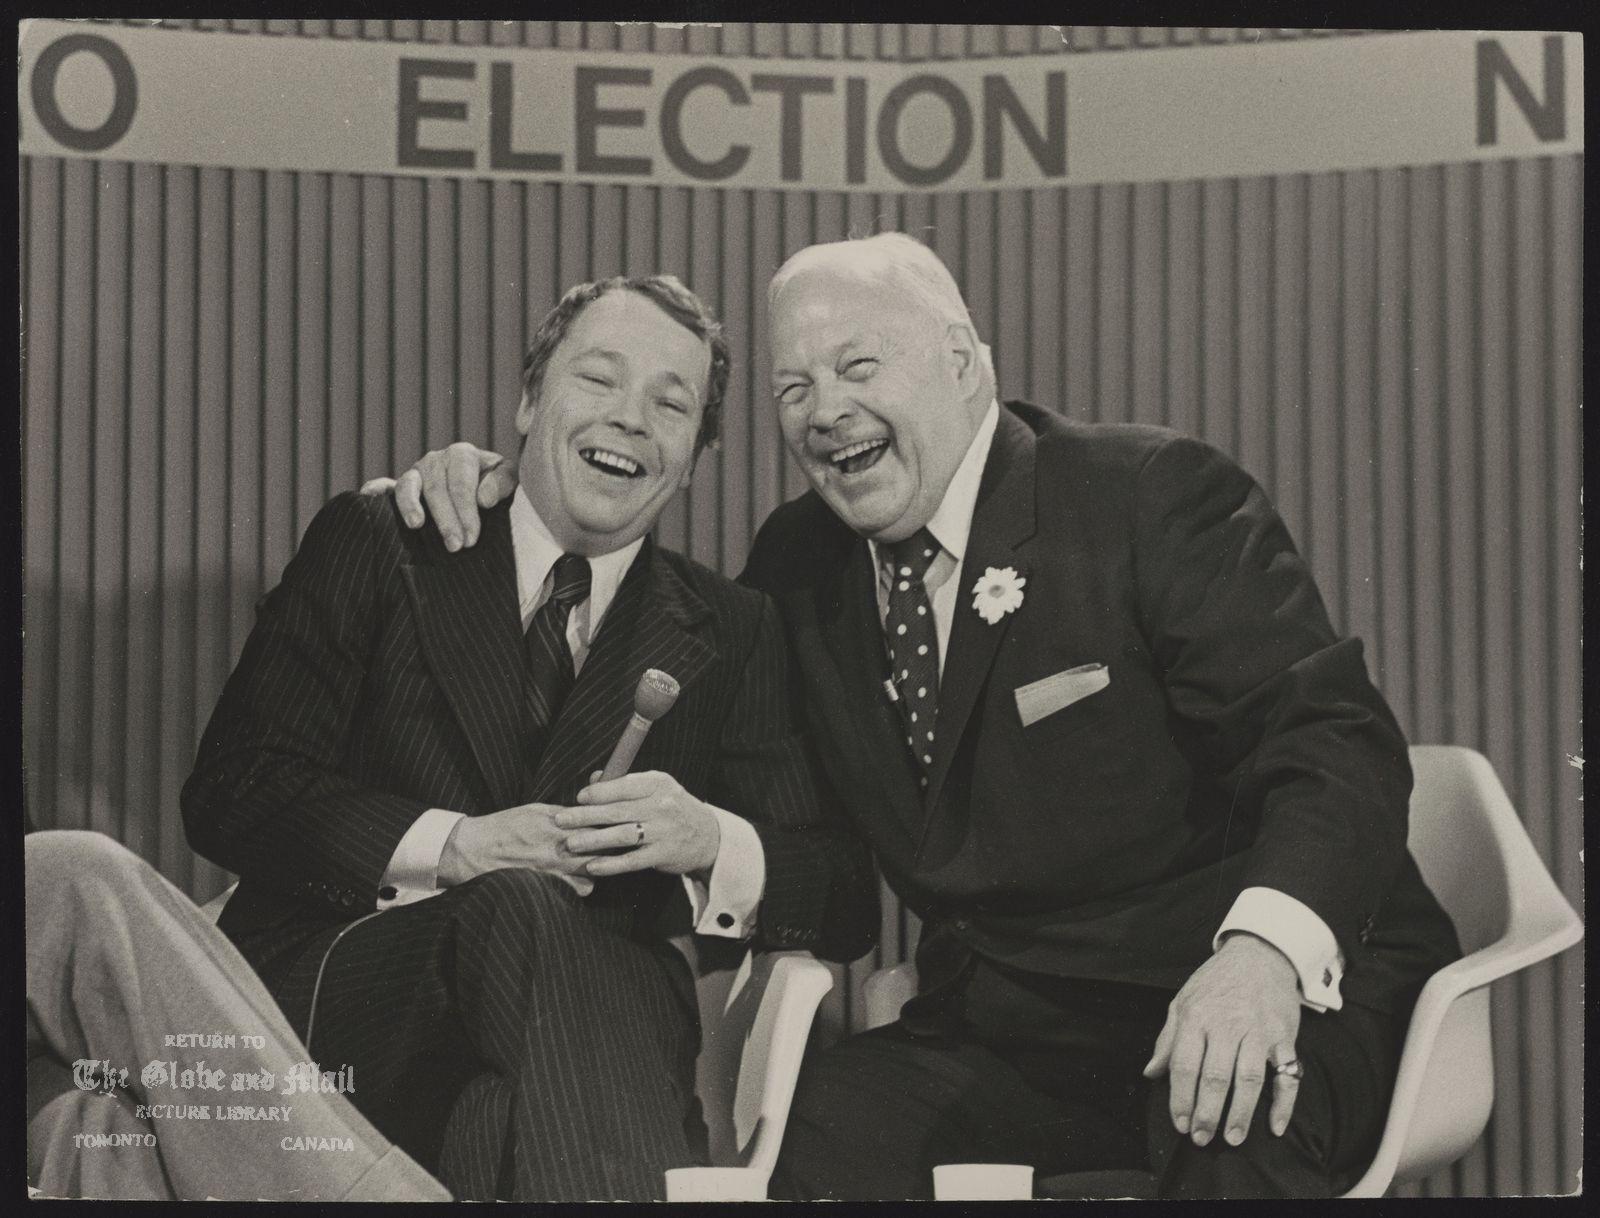 David CROMBIE Toronto. Politician with Allan Lamport